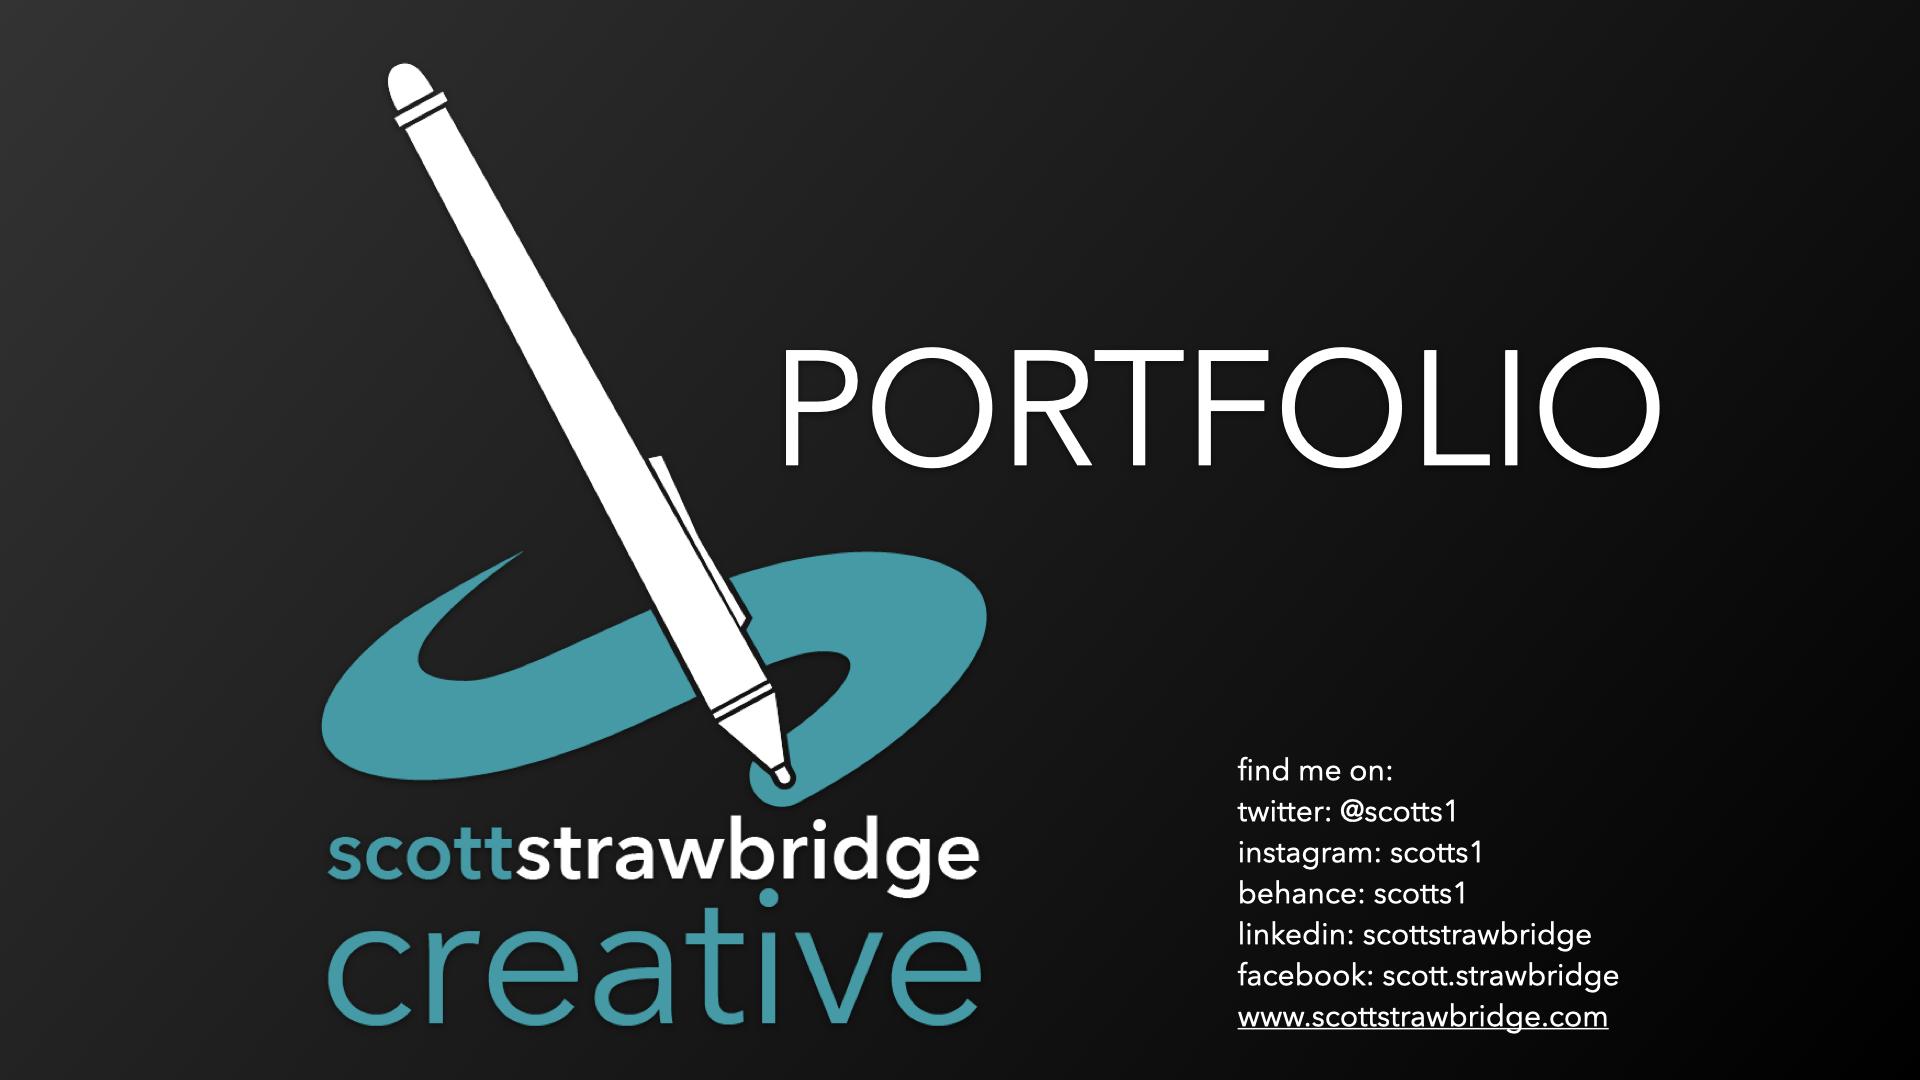 scott-strawbridge-portfolio-2021001